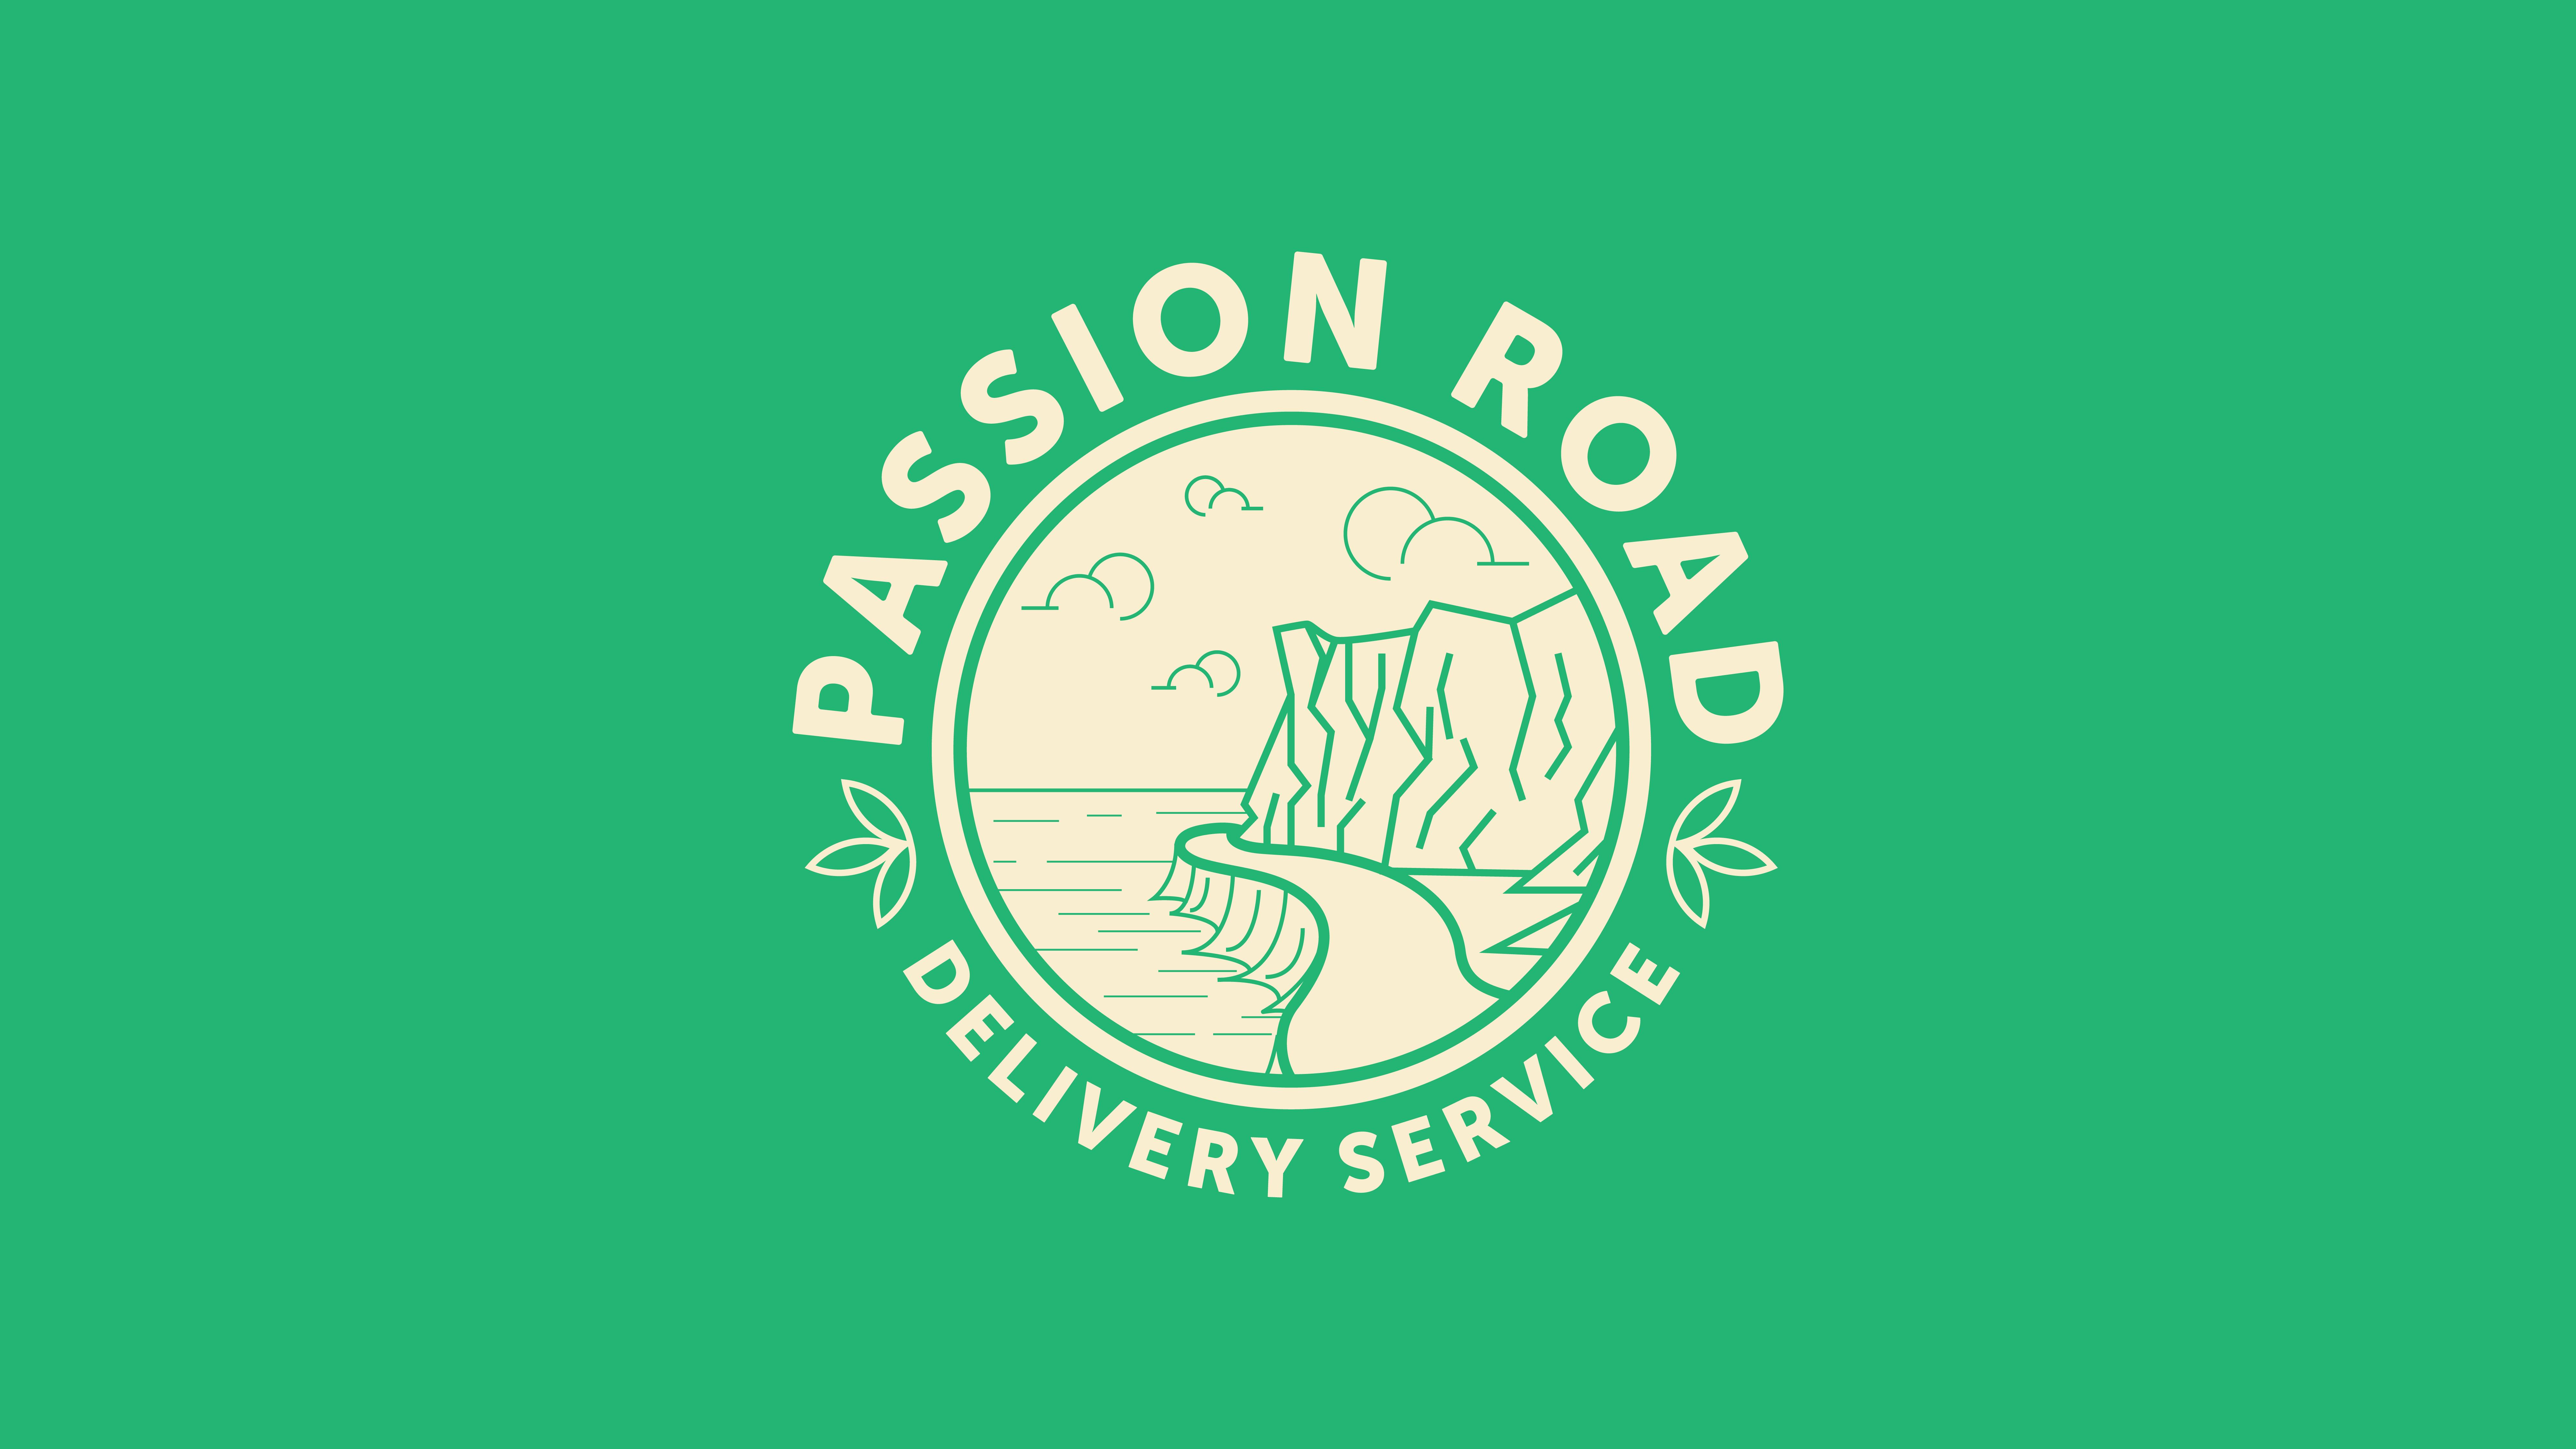 Passion_Road-26